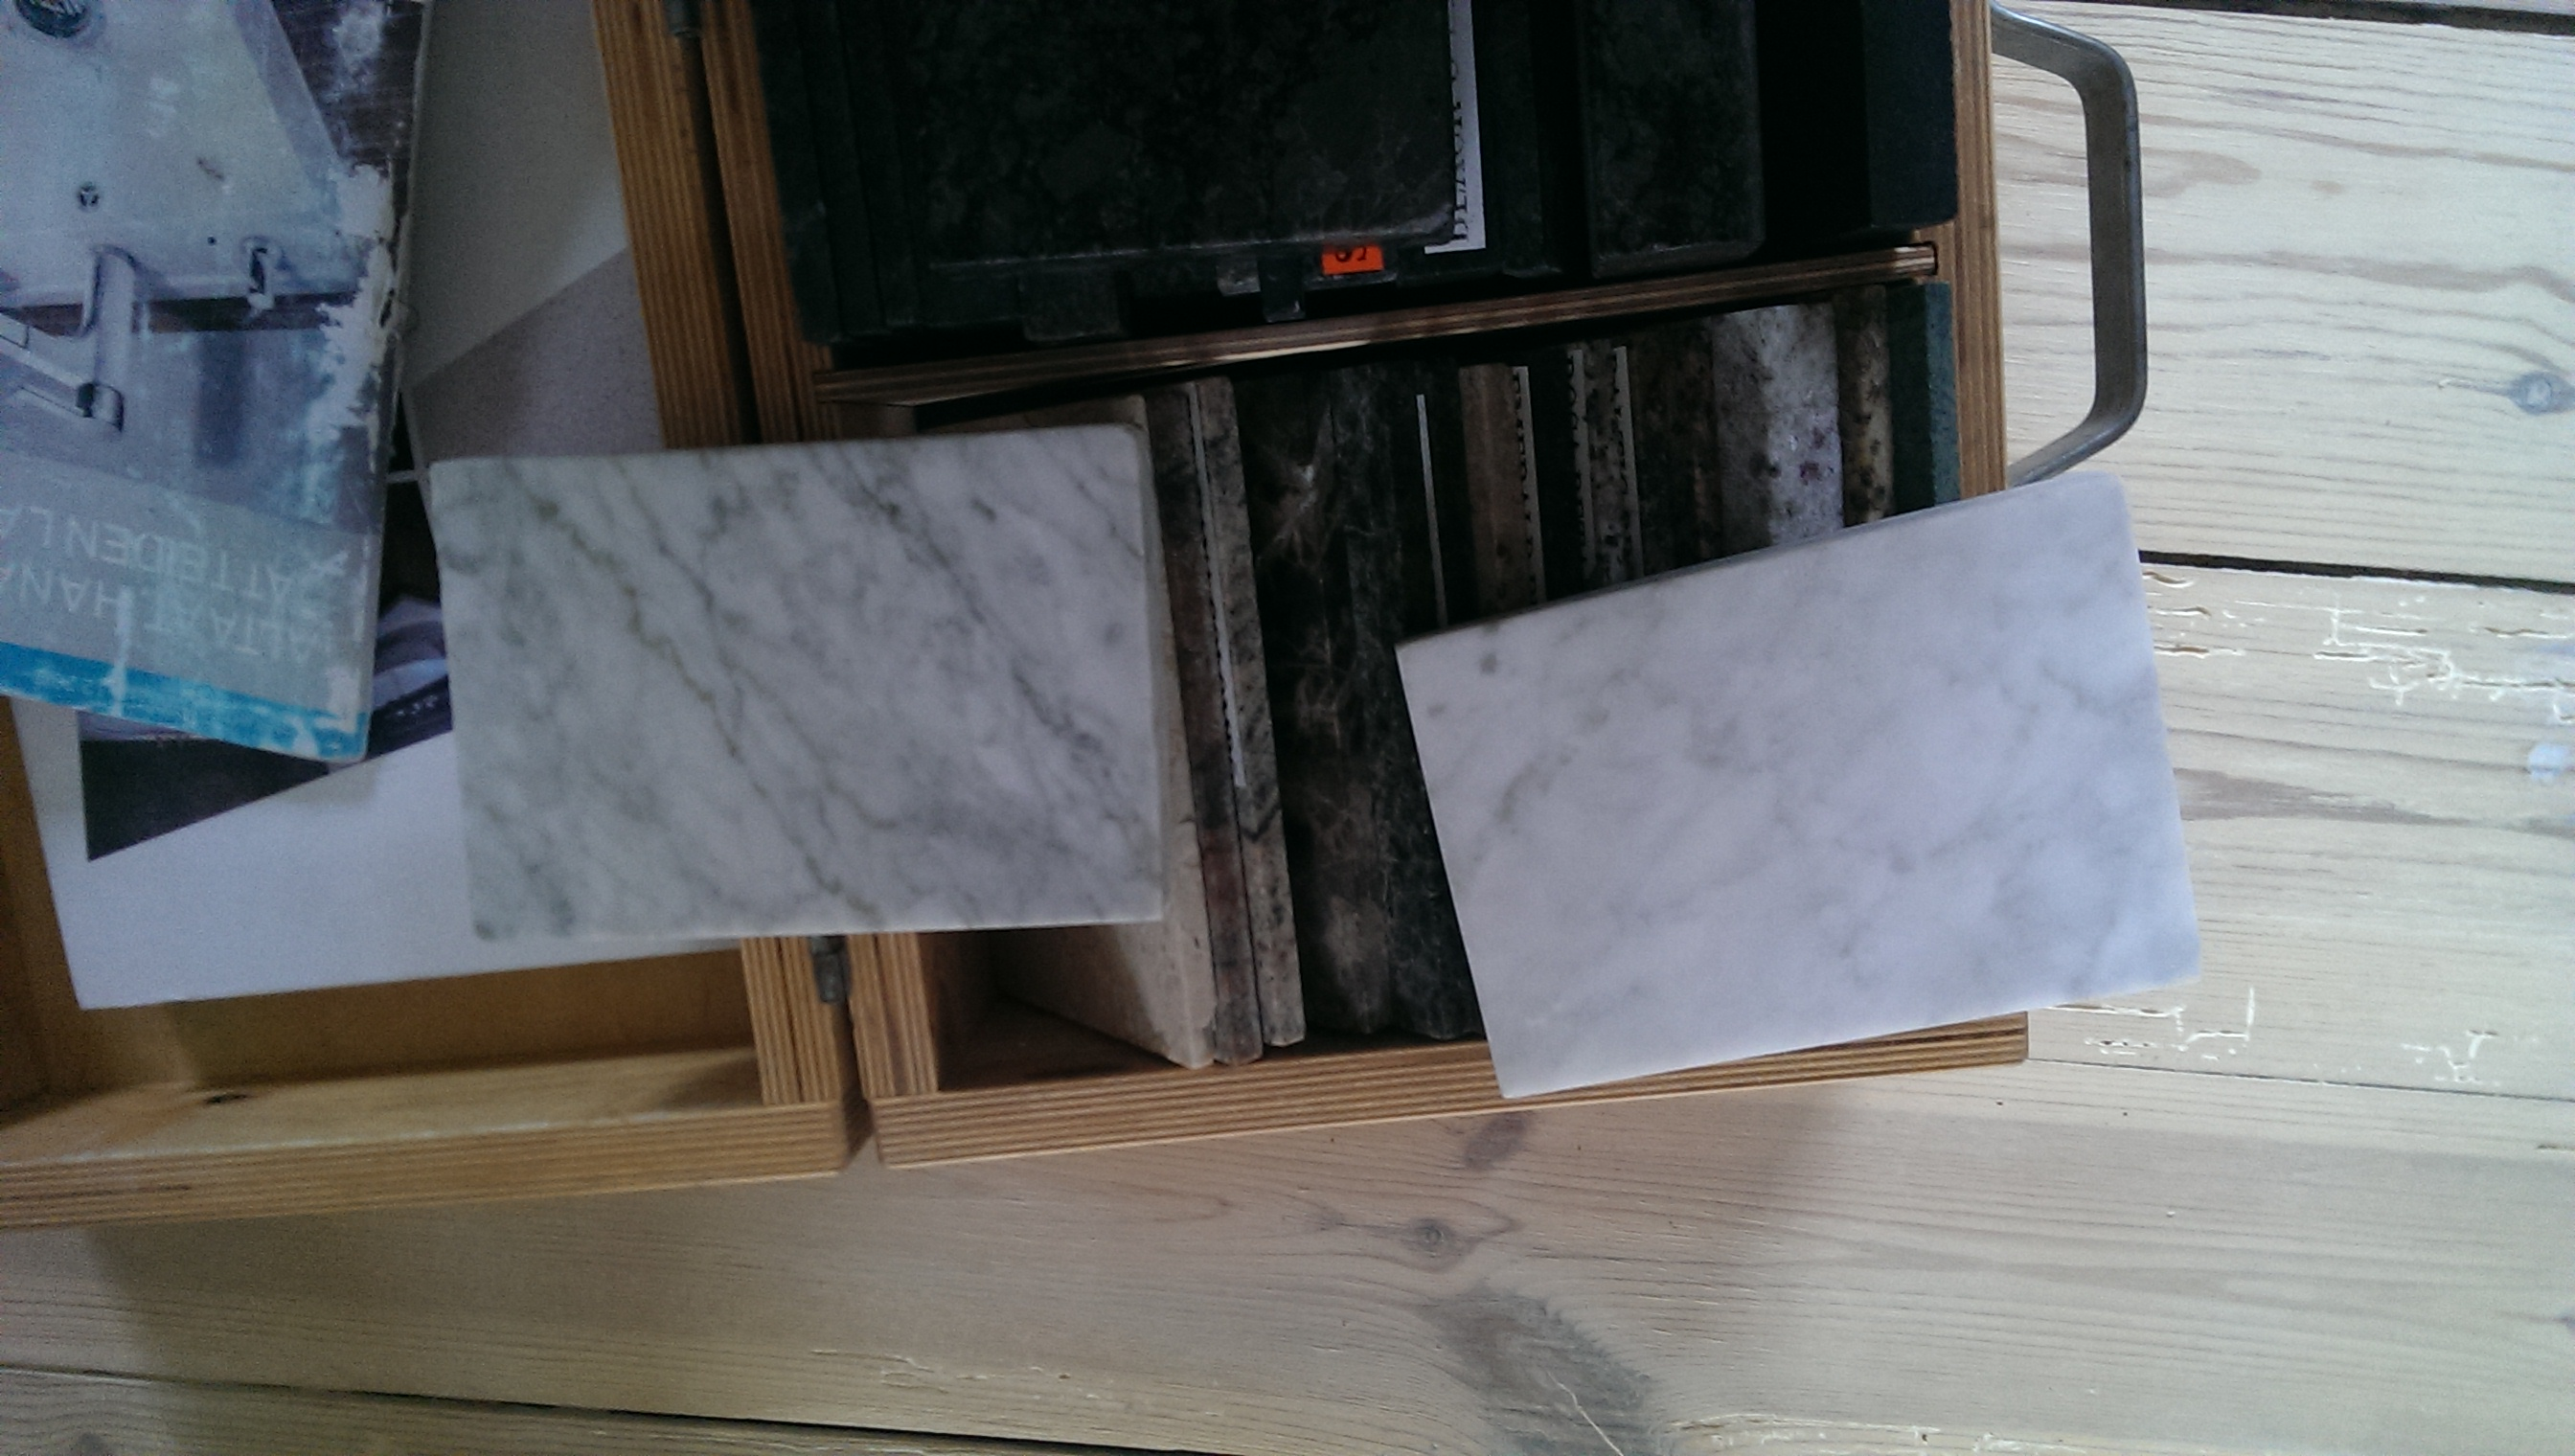 Kok Marmorskiva : kok bonkskiva marmor  Bonkskiva i koket Hur svort kan det vara